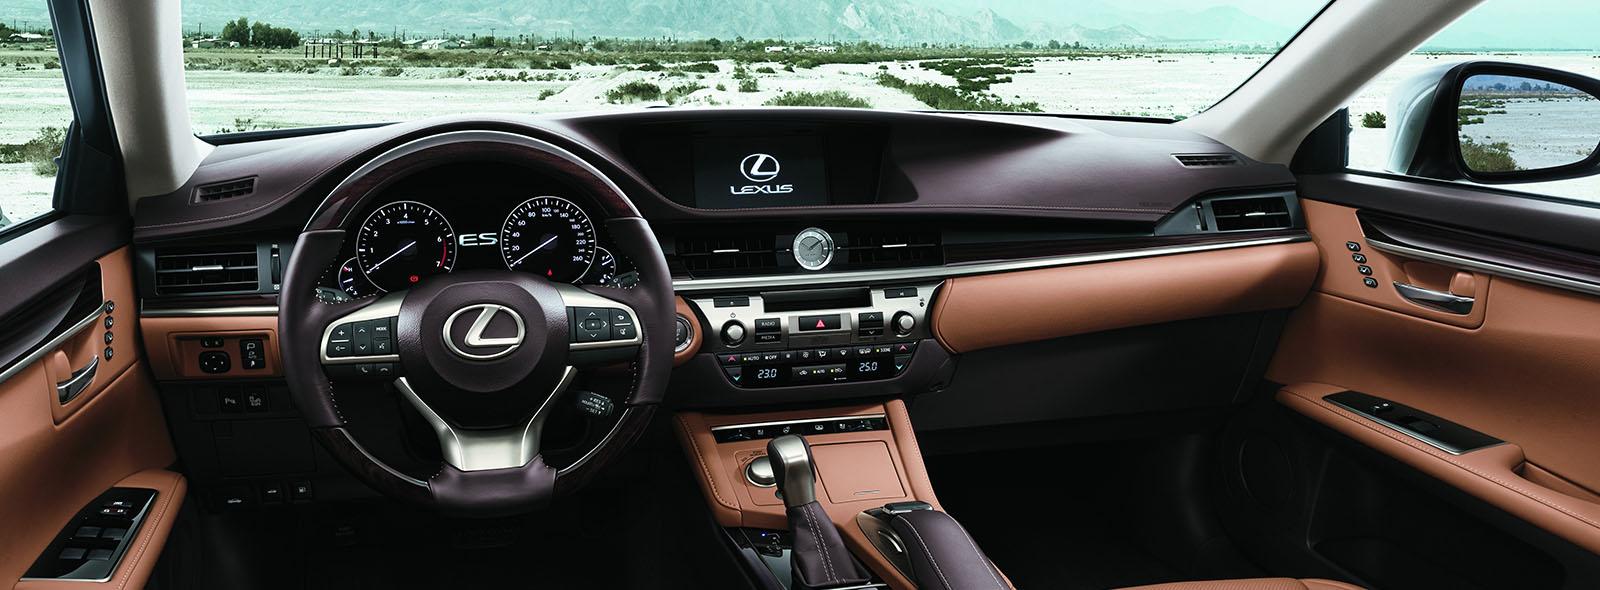 Внутренний вид Lexus ES 350